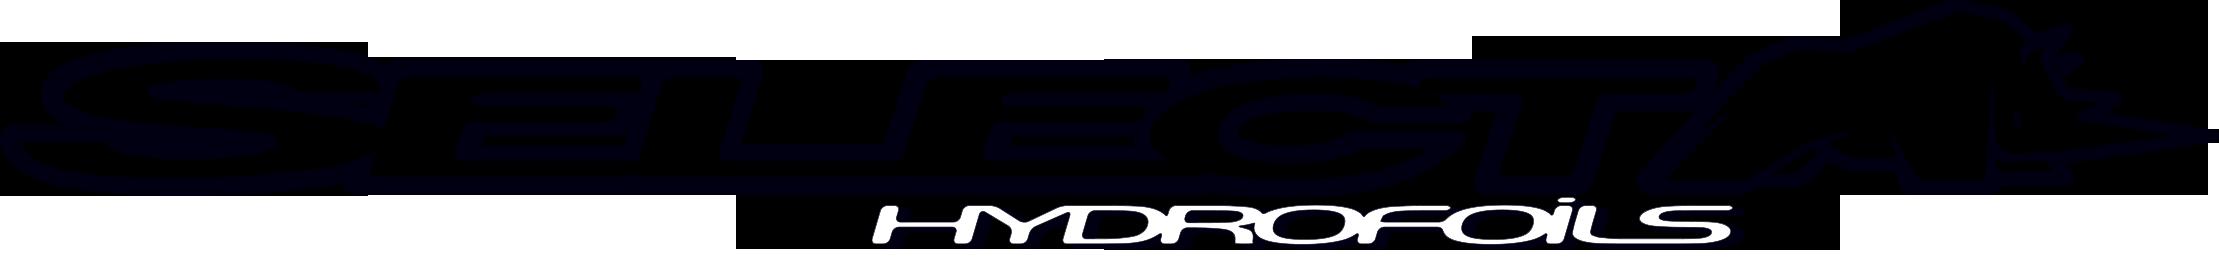 Select logo